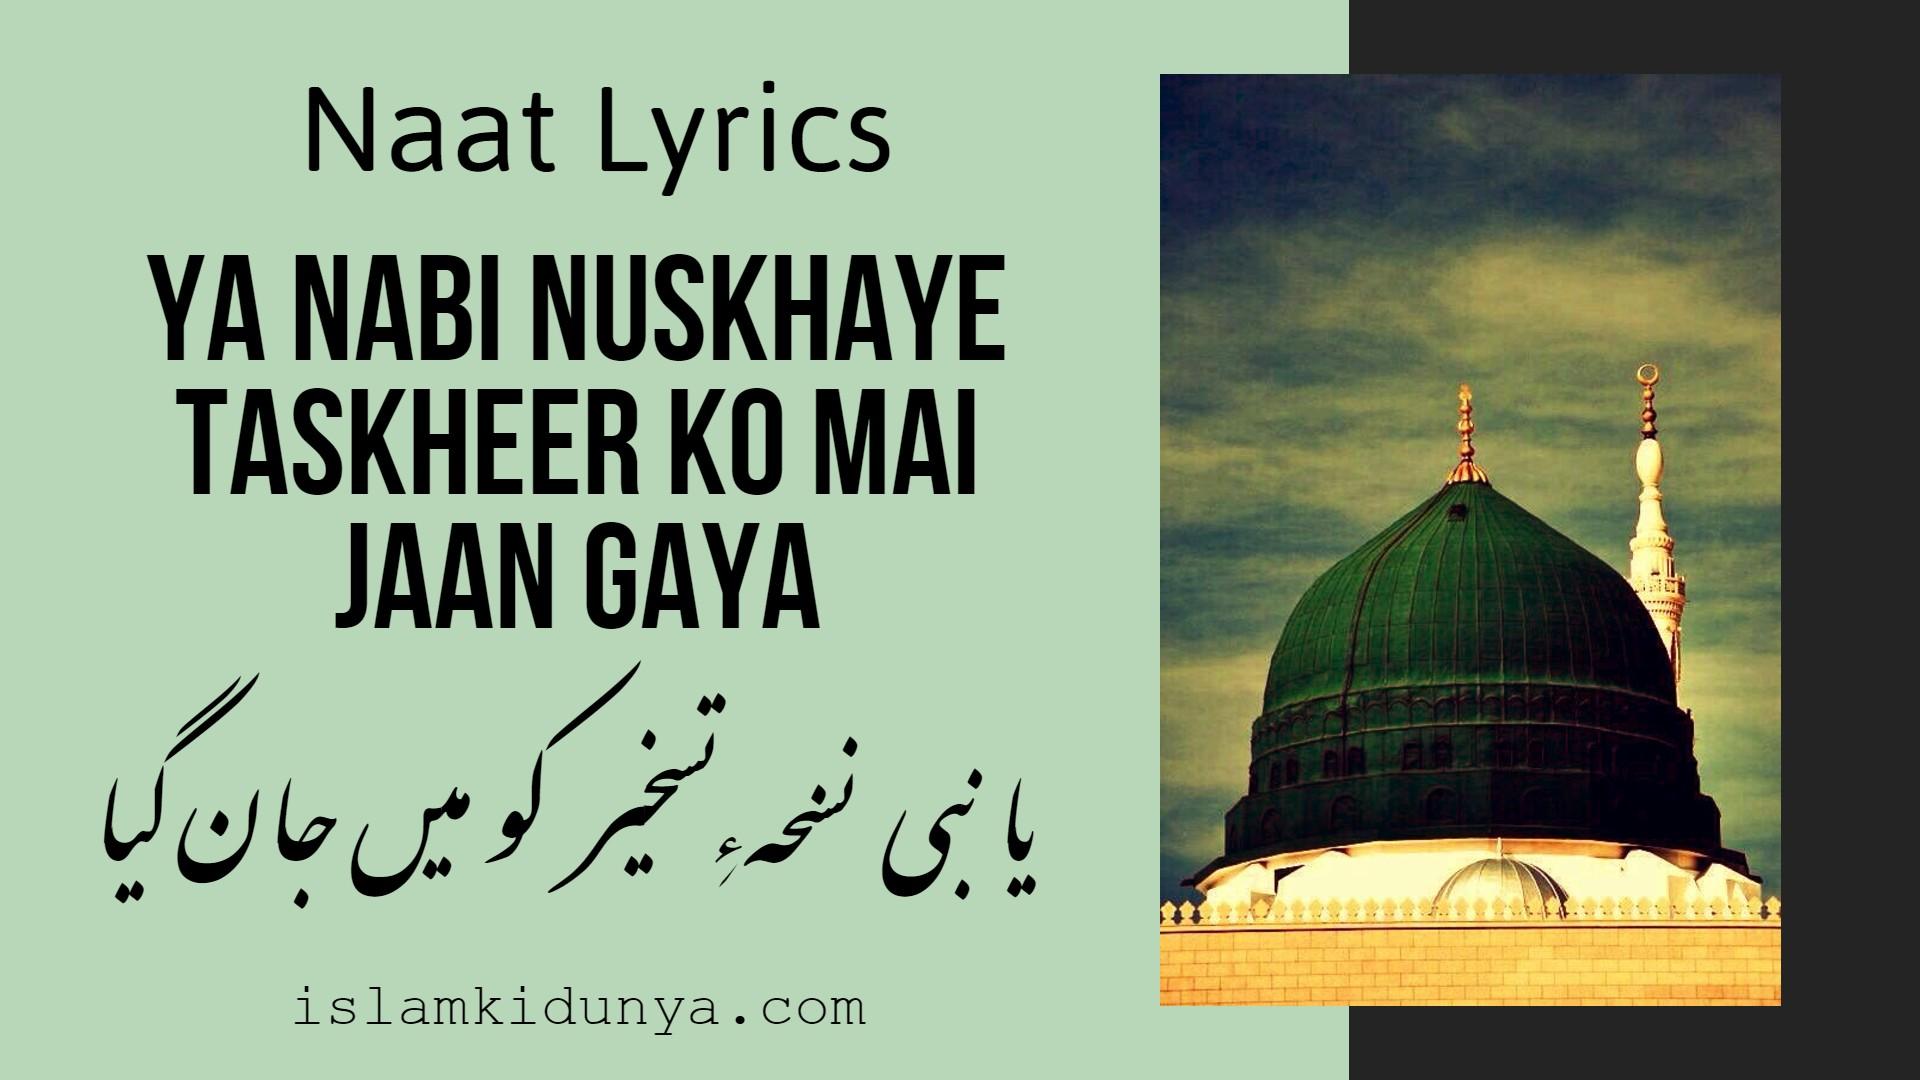 Ya Nabi Nuskhaye Taskheer Ko Mai Jaan Gaya - Naat Lyrics - Yousuf Memon